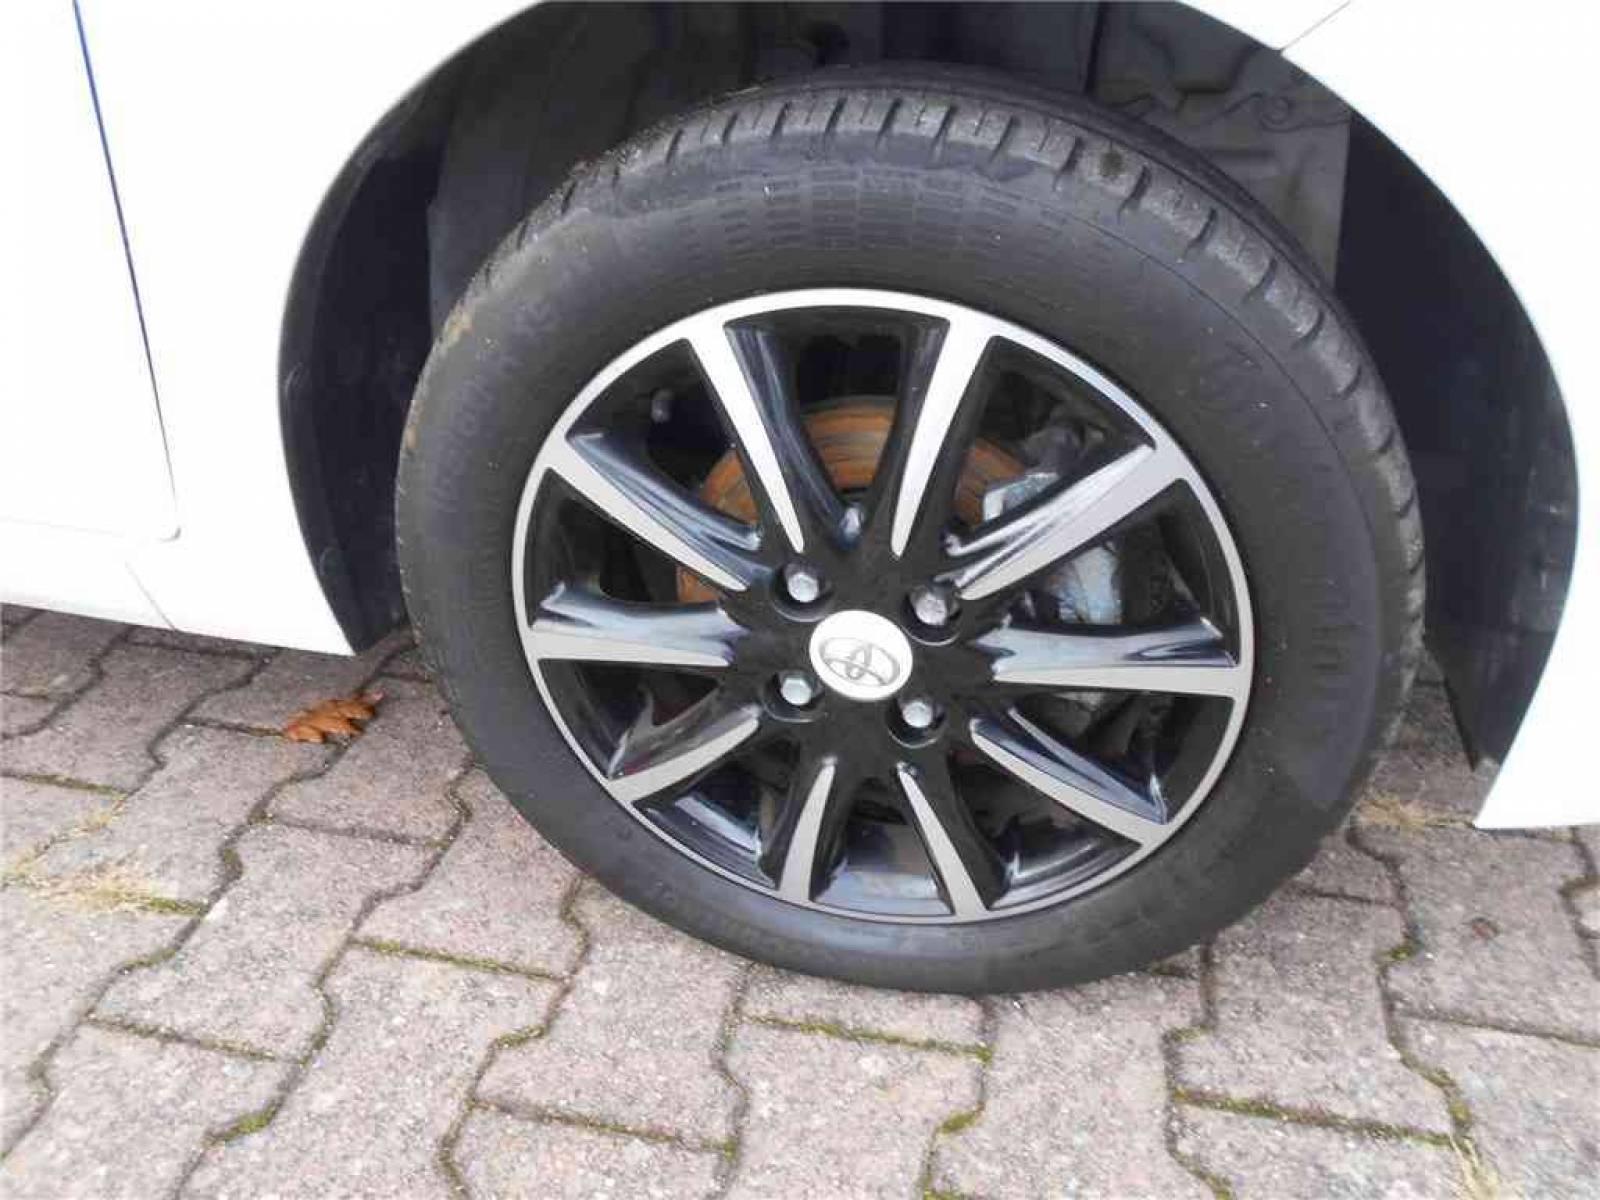 TOYOTA Aygo 1.0 VVT-i - véhicule d'occasion - Groupe Guillet - Chalon Automobiles - 71100 - Chalon-sur-Saône - 22